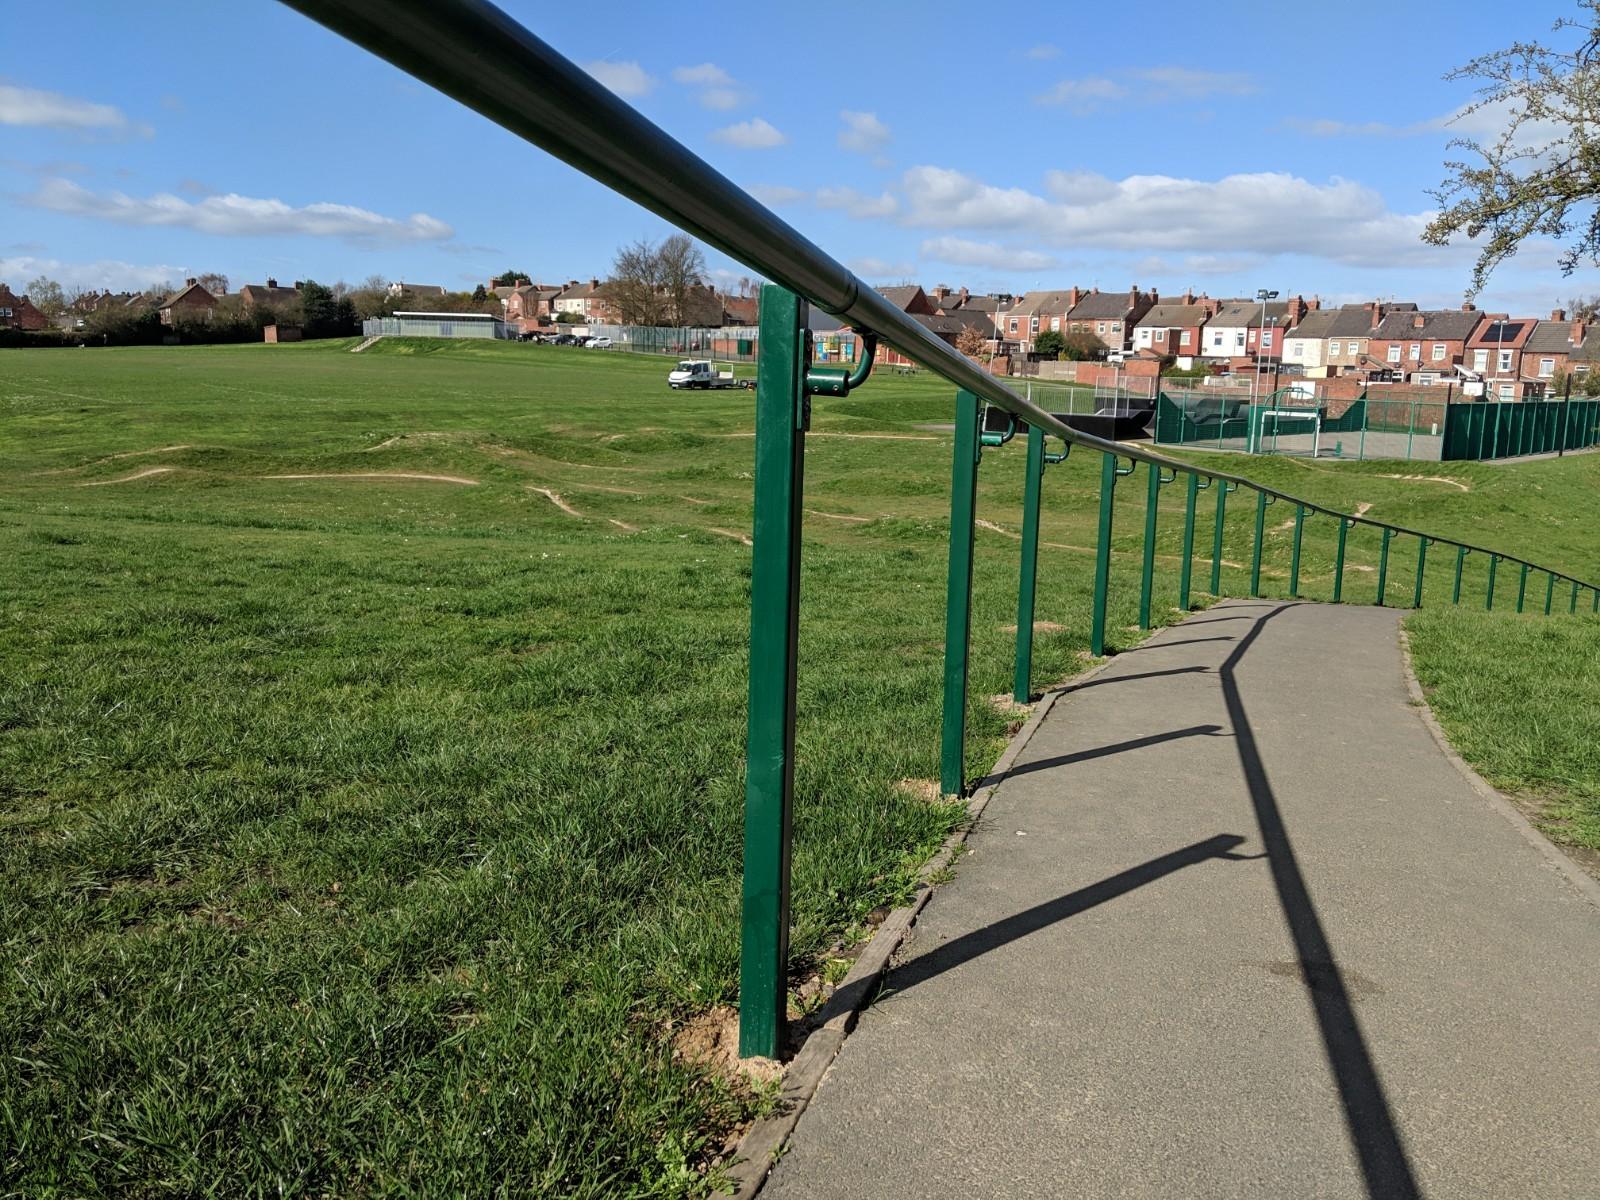 South Normanton Recreation Ground